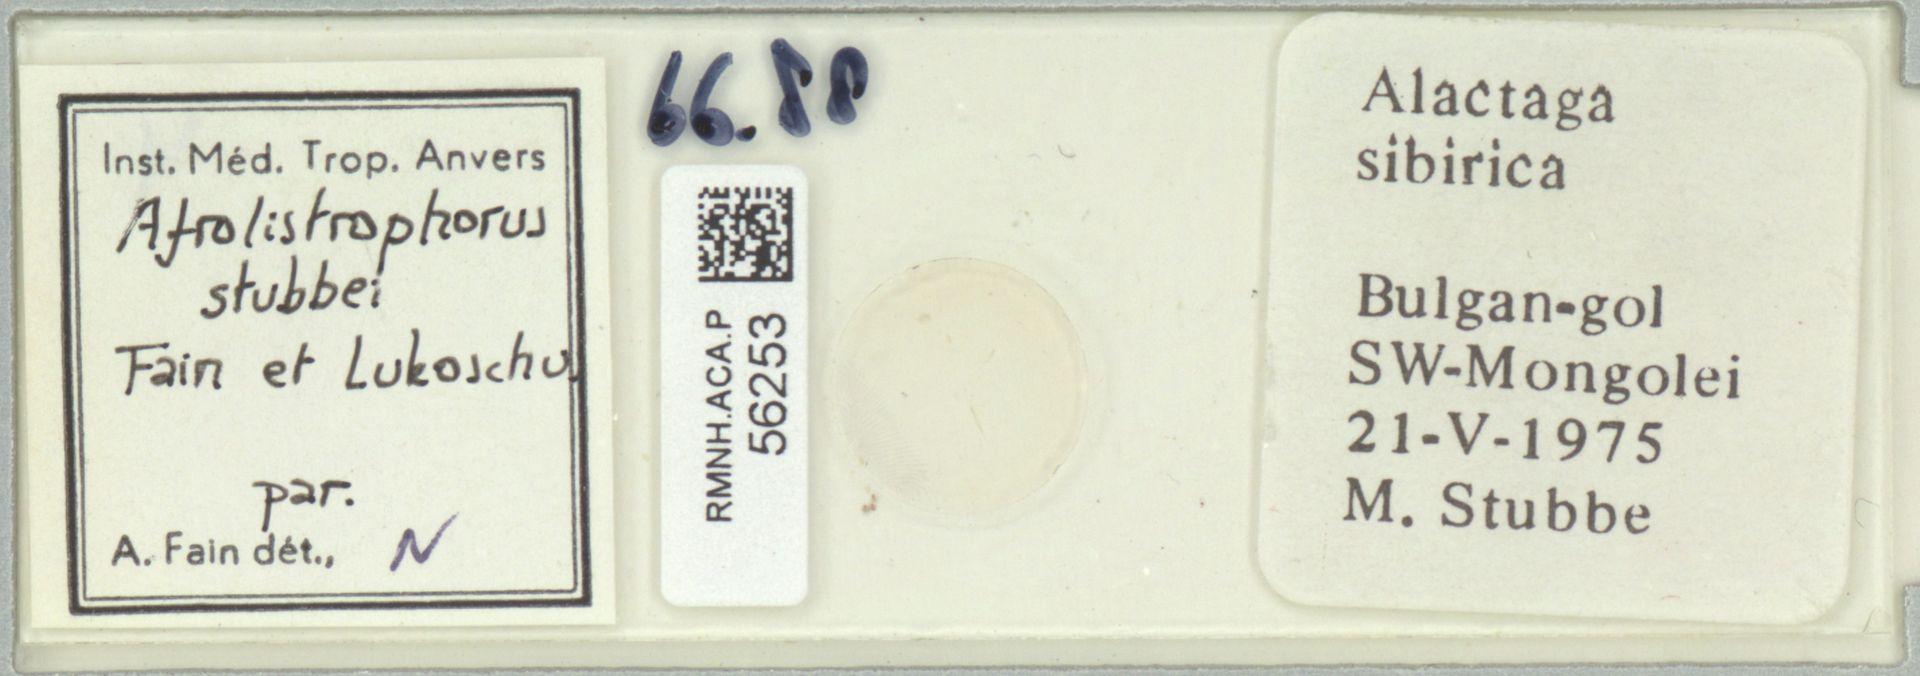 RMNH.ACA.P.56253   Afrolistrophorus stubbei Fain et Lukoschus